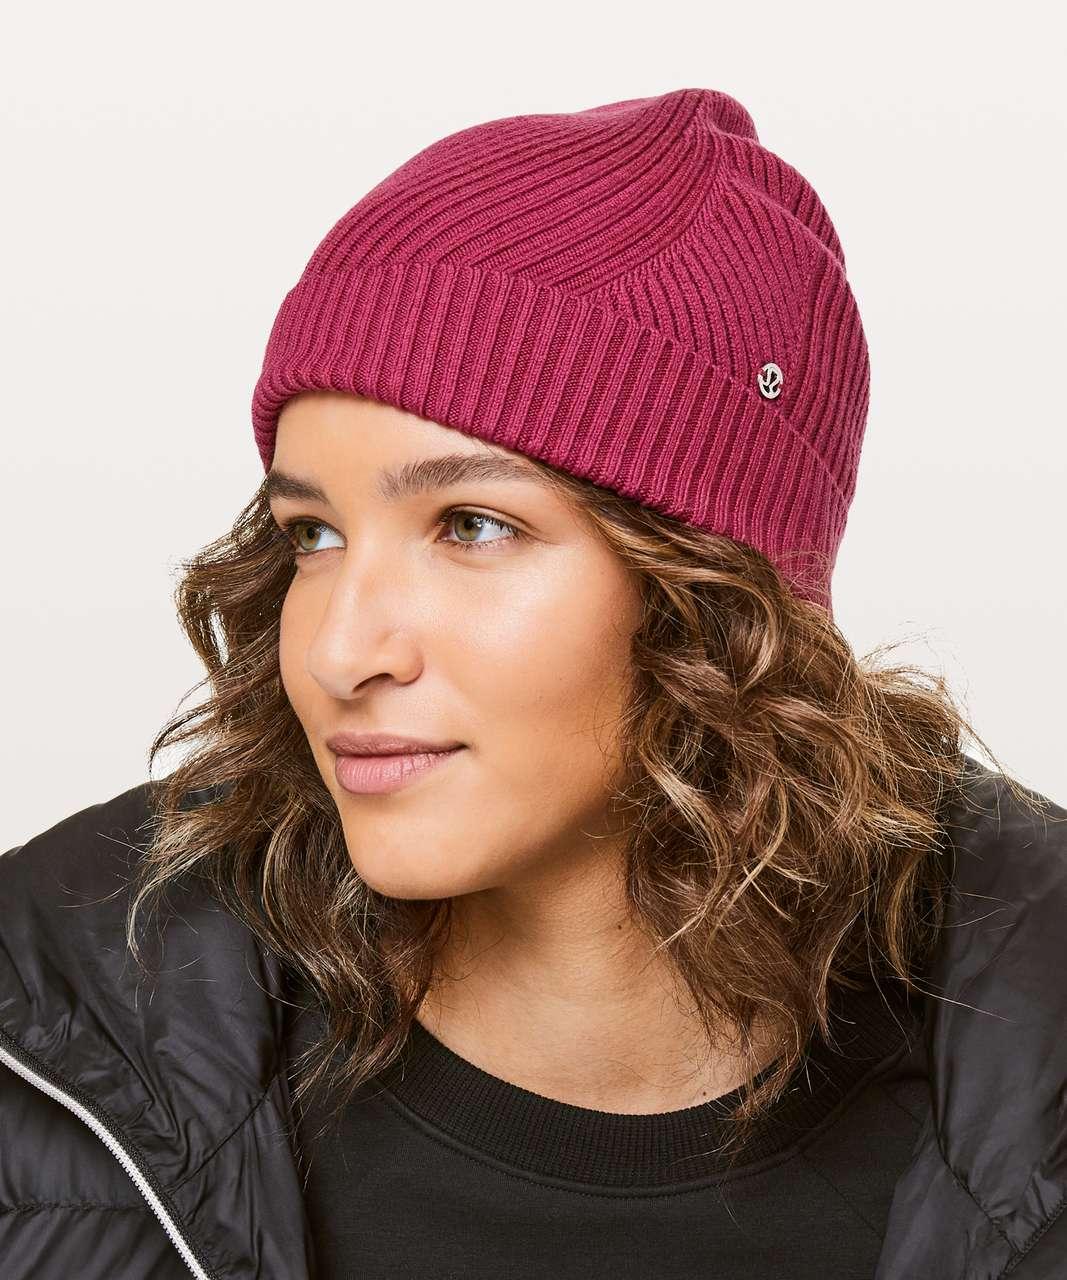 3904b5763 Lululemon Twist Of Cozy Knit Beanie - Violet Red